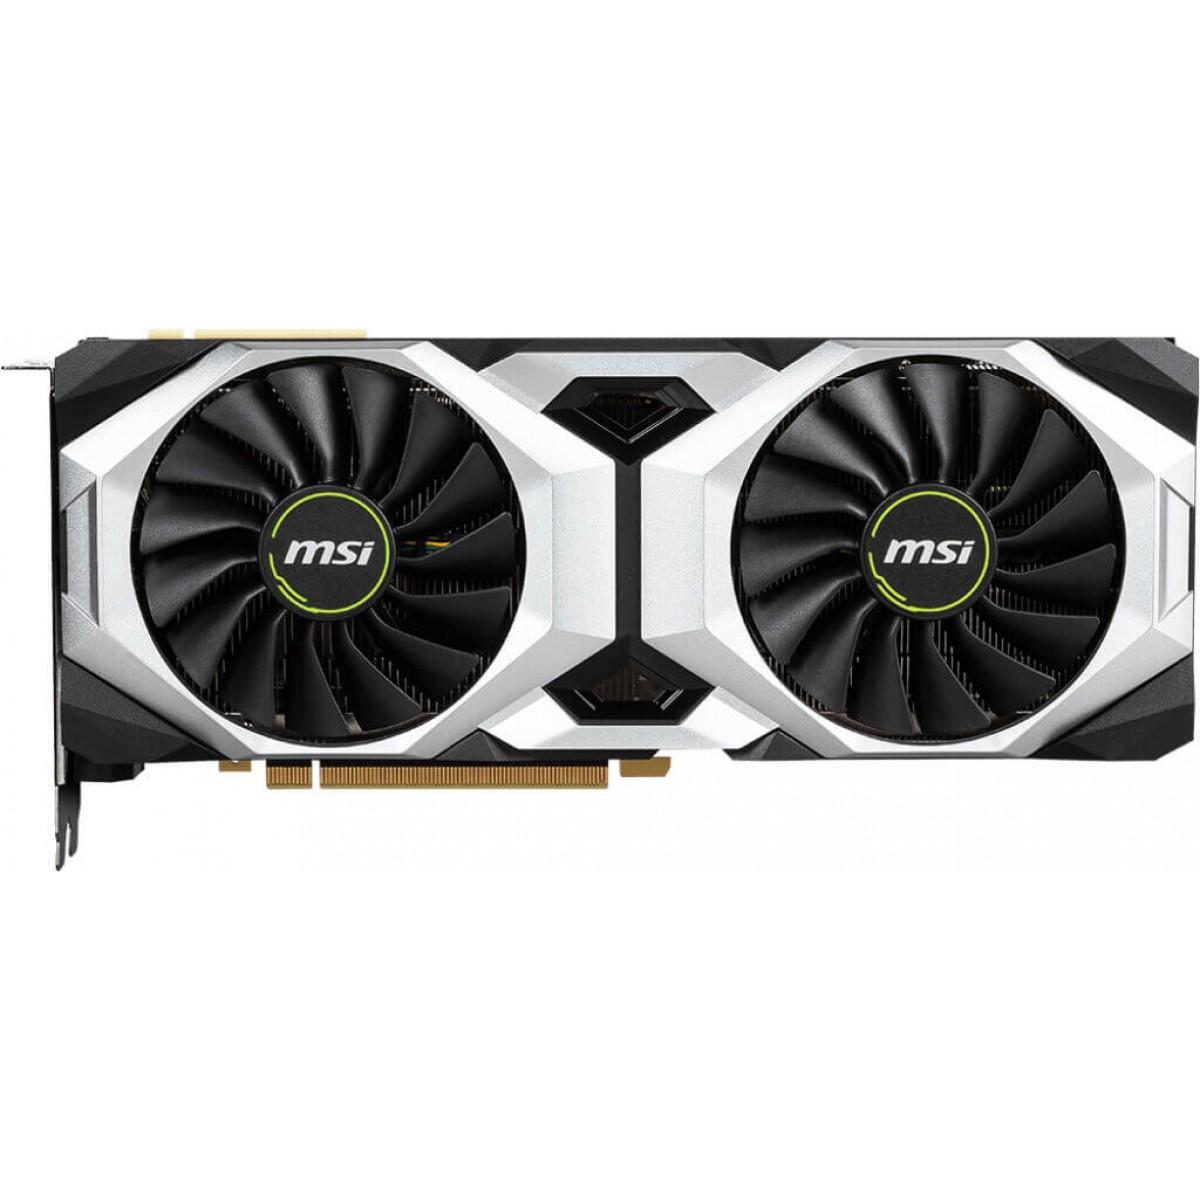 Placa de Video MSI GeForce RTX 2080 Ventus Dual, 8GB GDDR6, 256Bit